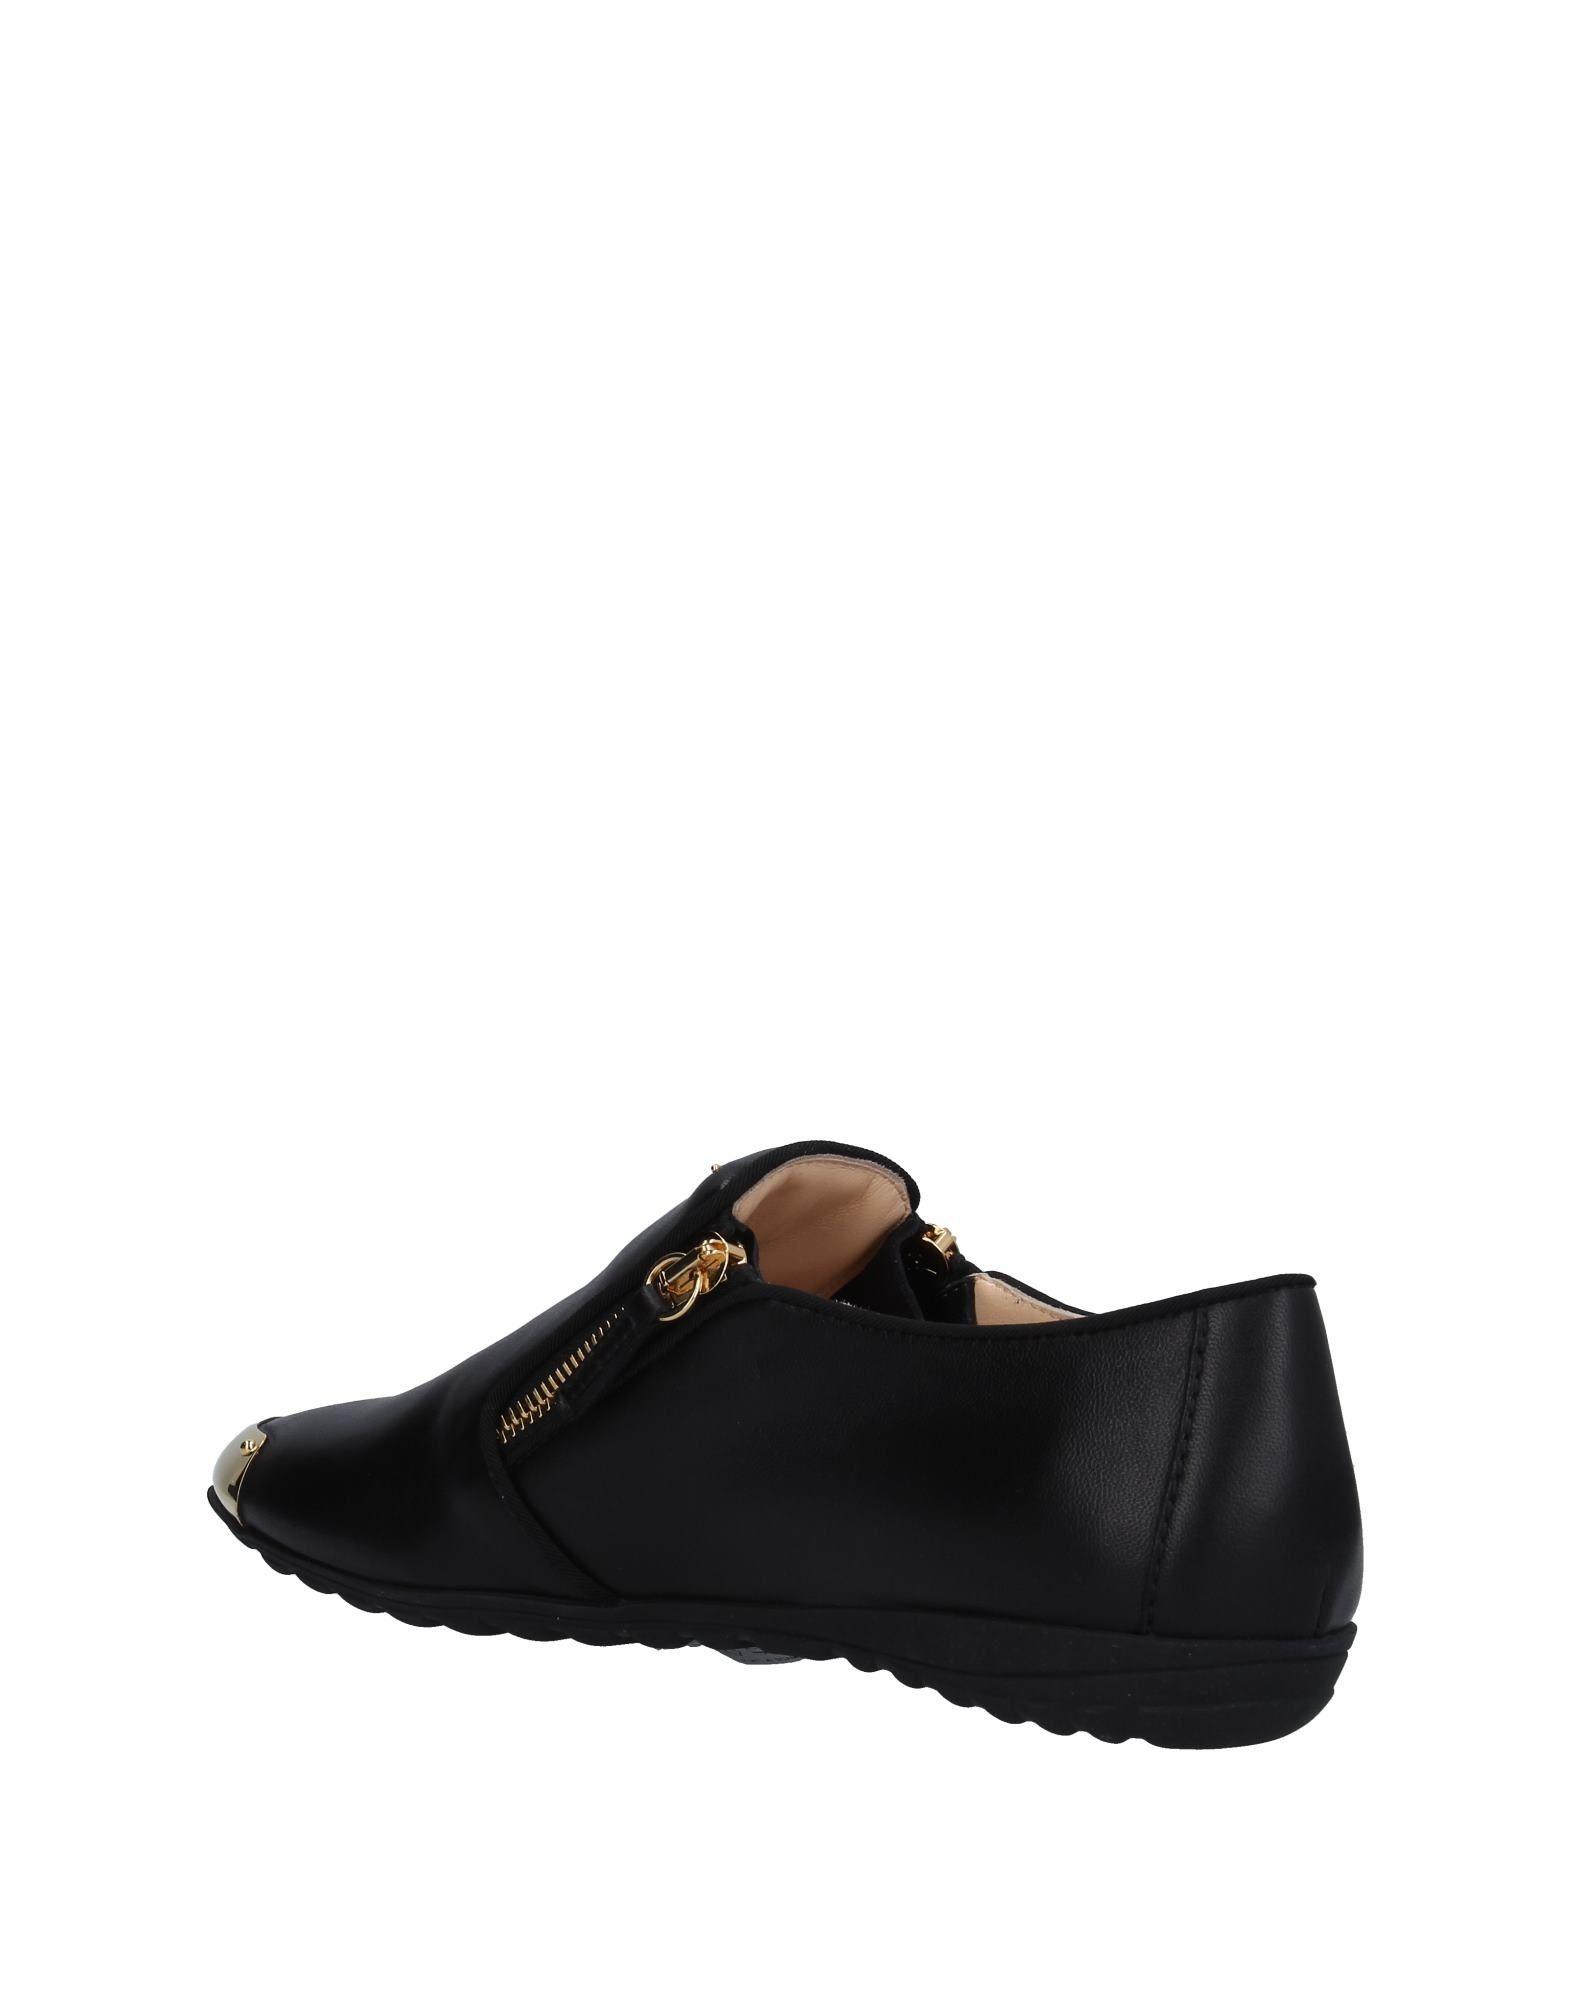 Giuseppe Zanotti Sneakers Damen  Schuhe 11312468XSGünstige gut aussehende Schuhe  2e83be